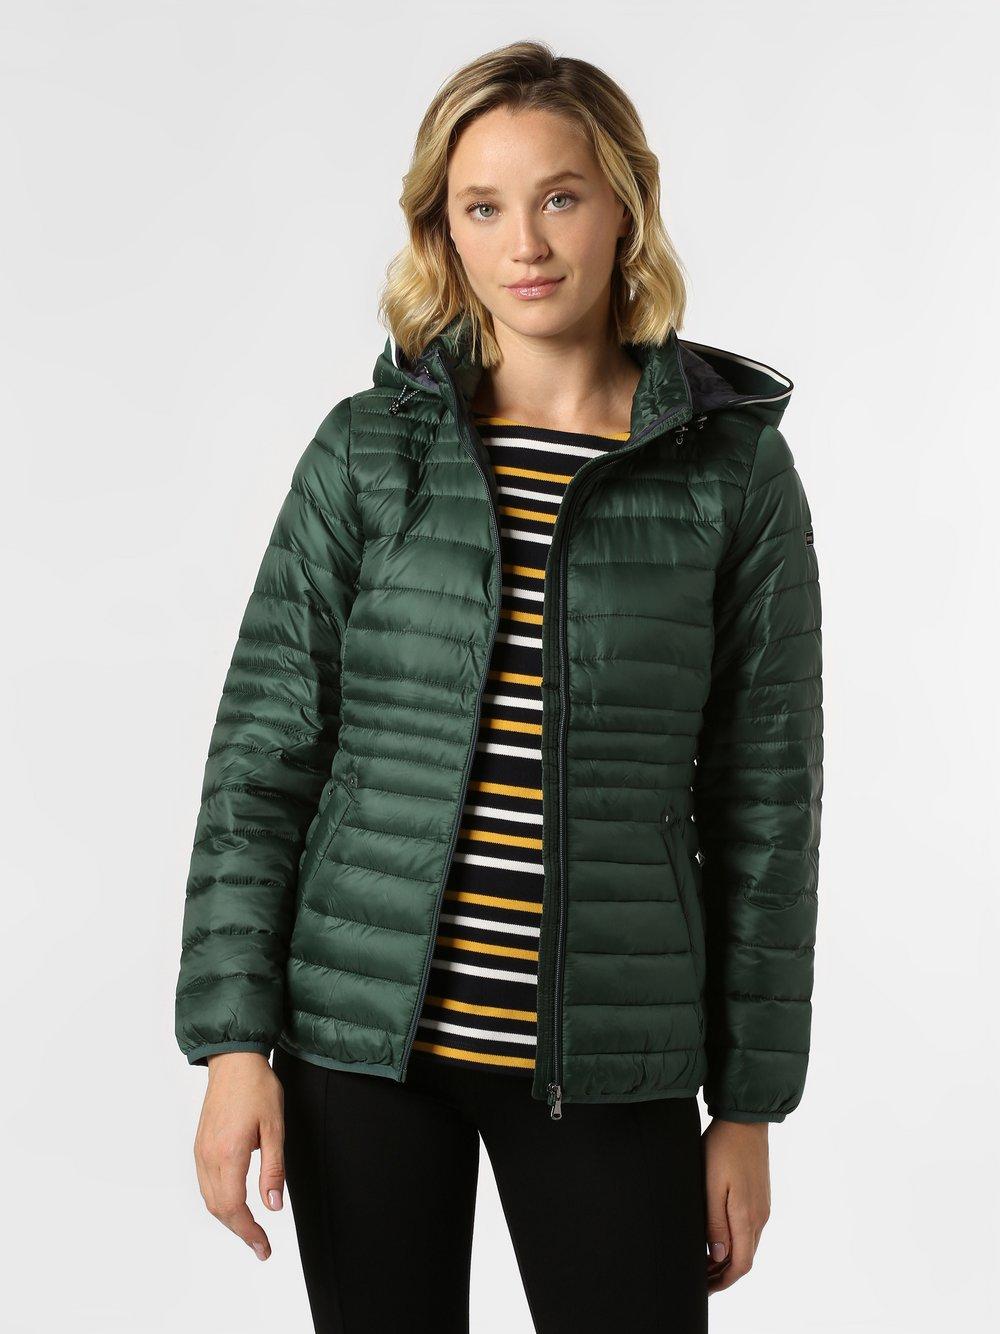 Esprit Casual - Damska kurtka pikowana, zielony